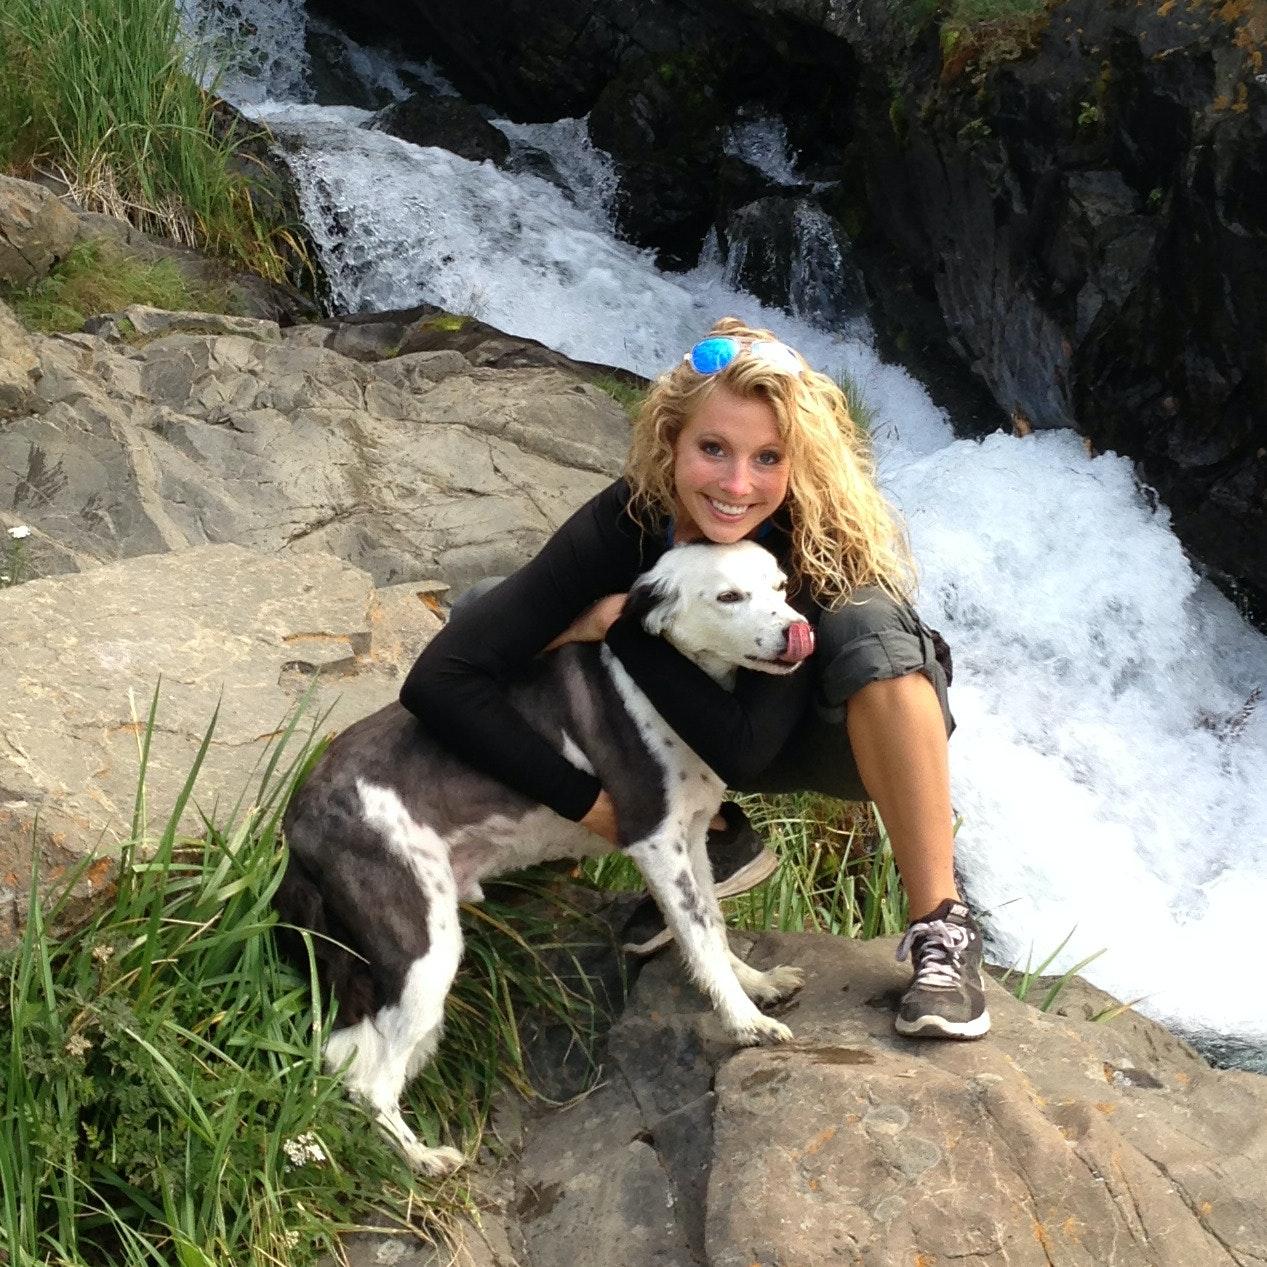 April's dog day care